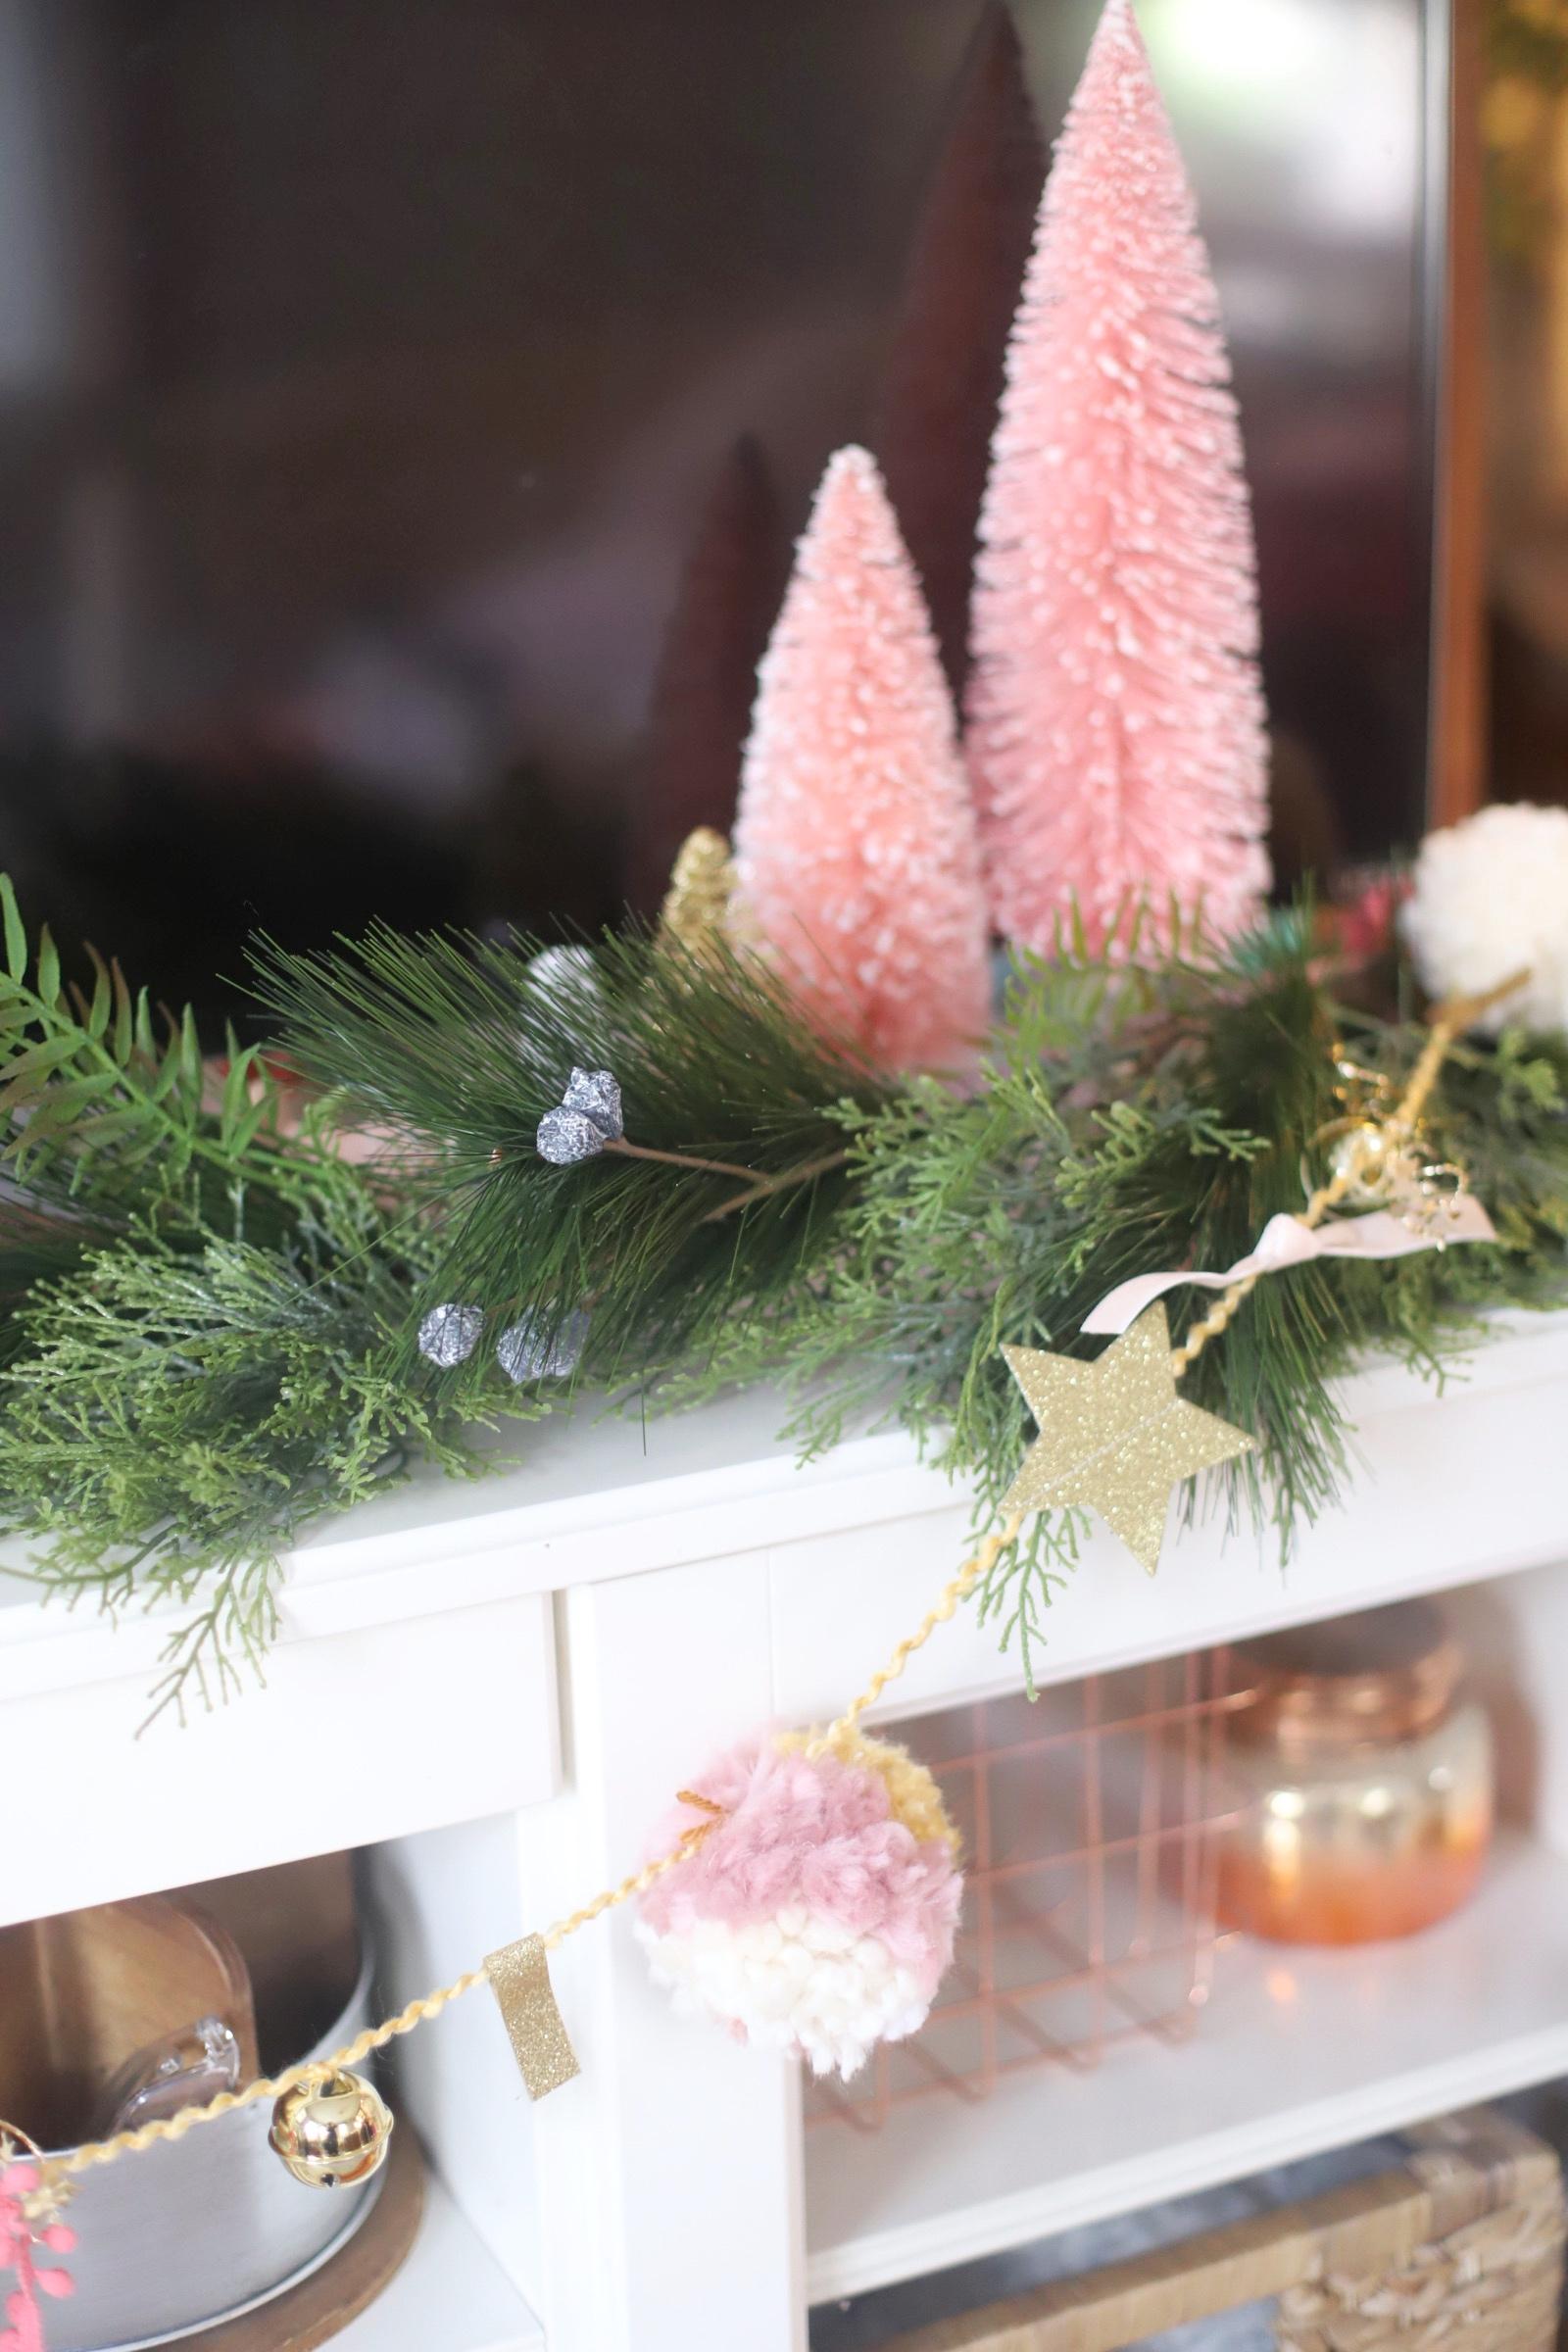 Make your own boutique-worthy DIY EMbellished pom pom garland with festive tinsel, ribbon, washi ape, and glitter stars; a.k.a., a glammed up pom pom garland with a whole lot of pizazz.| @glitterinclexi | GLITTERINC.COM